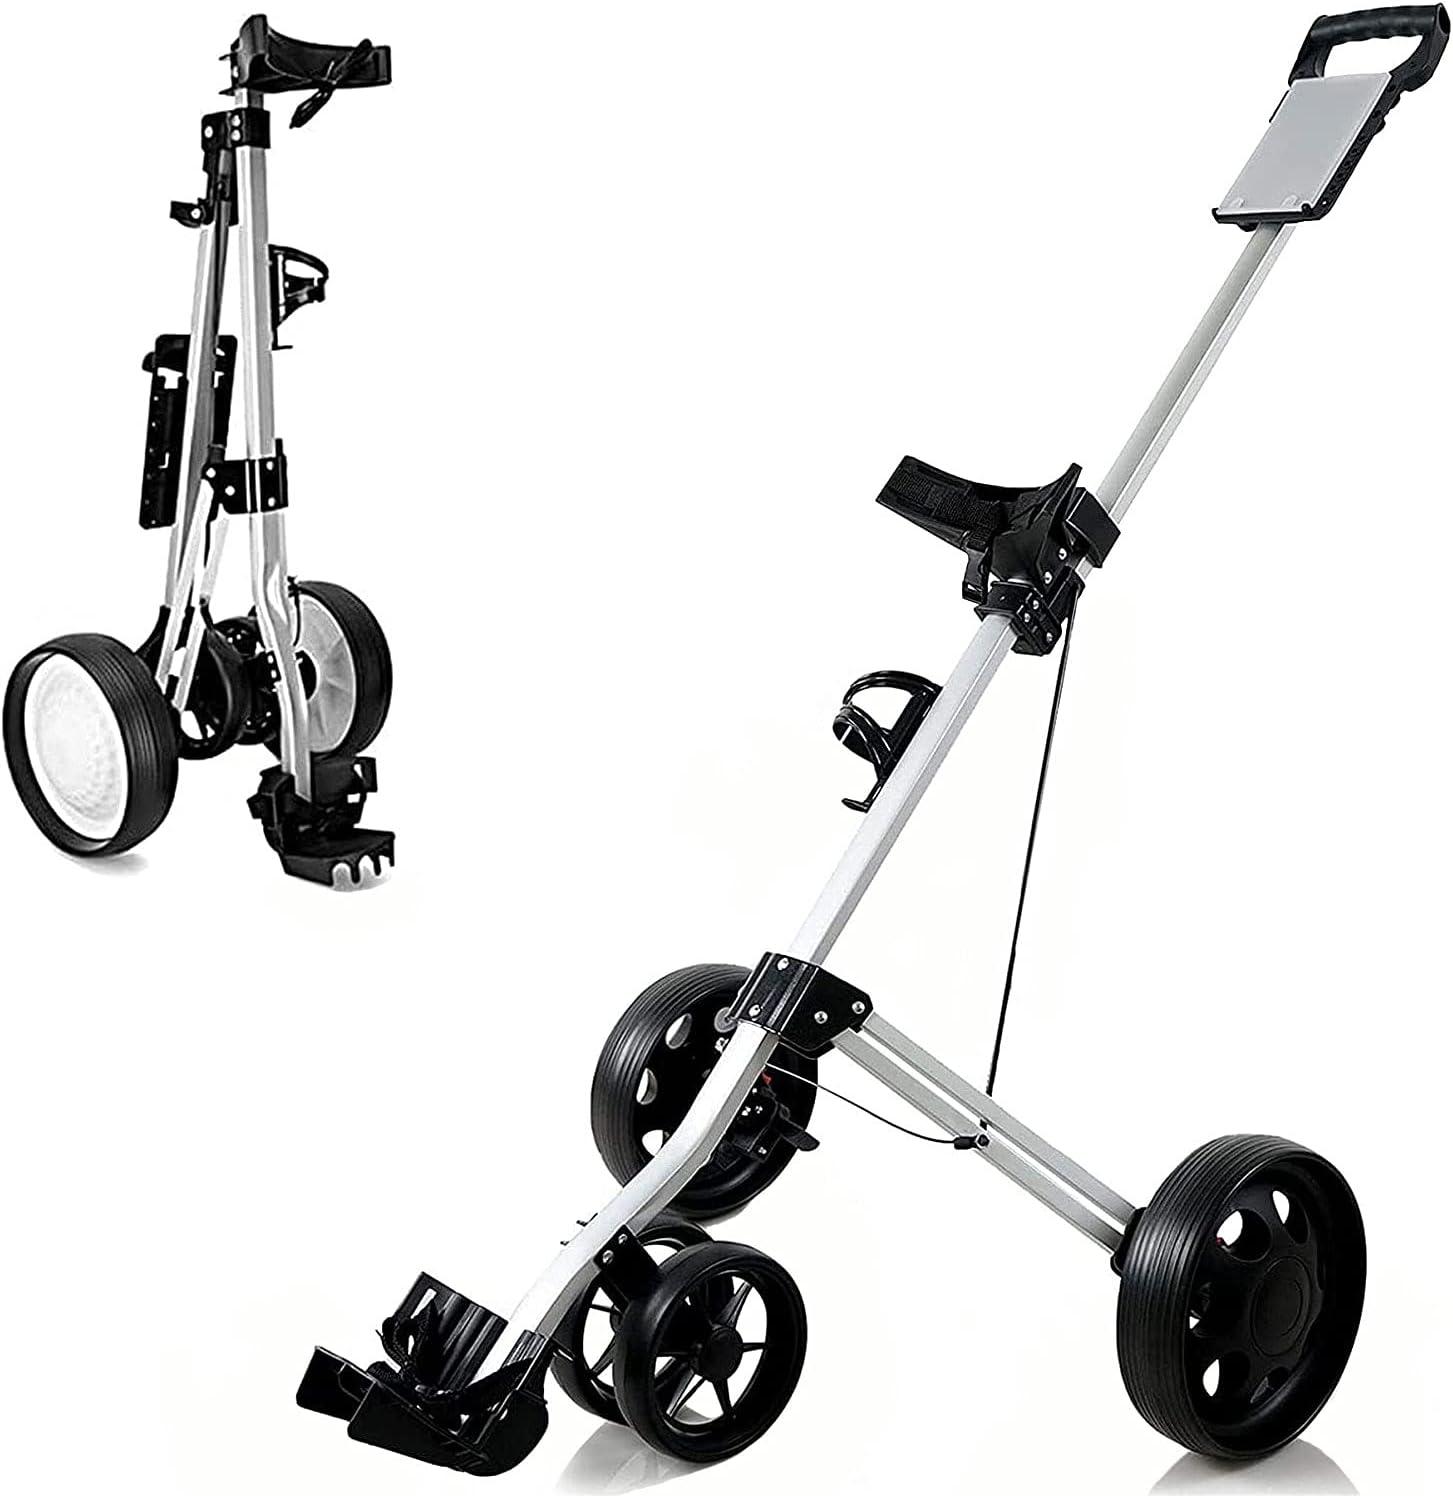 Golf Push Cart, 4 Wheel Golf Push Pull Cart with Cup Holder, Lig